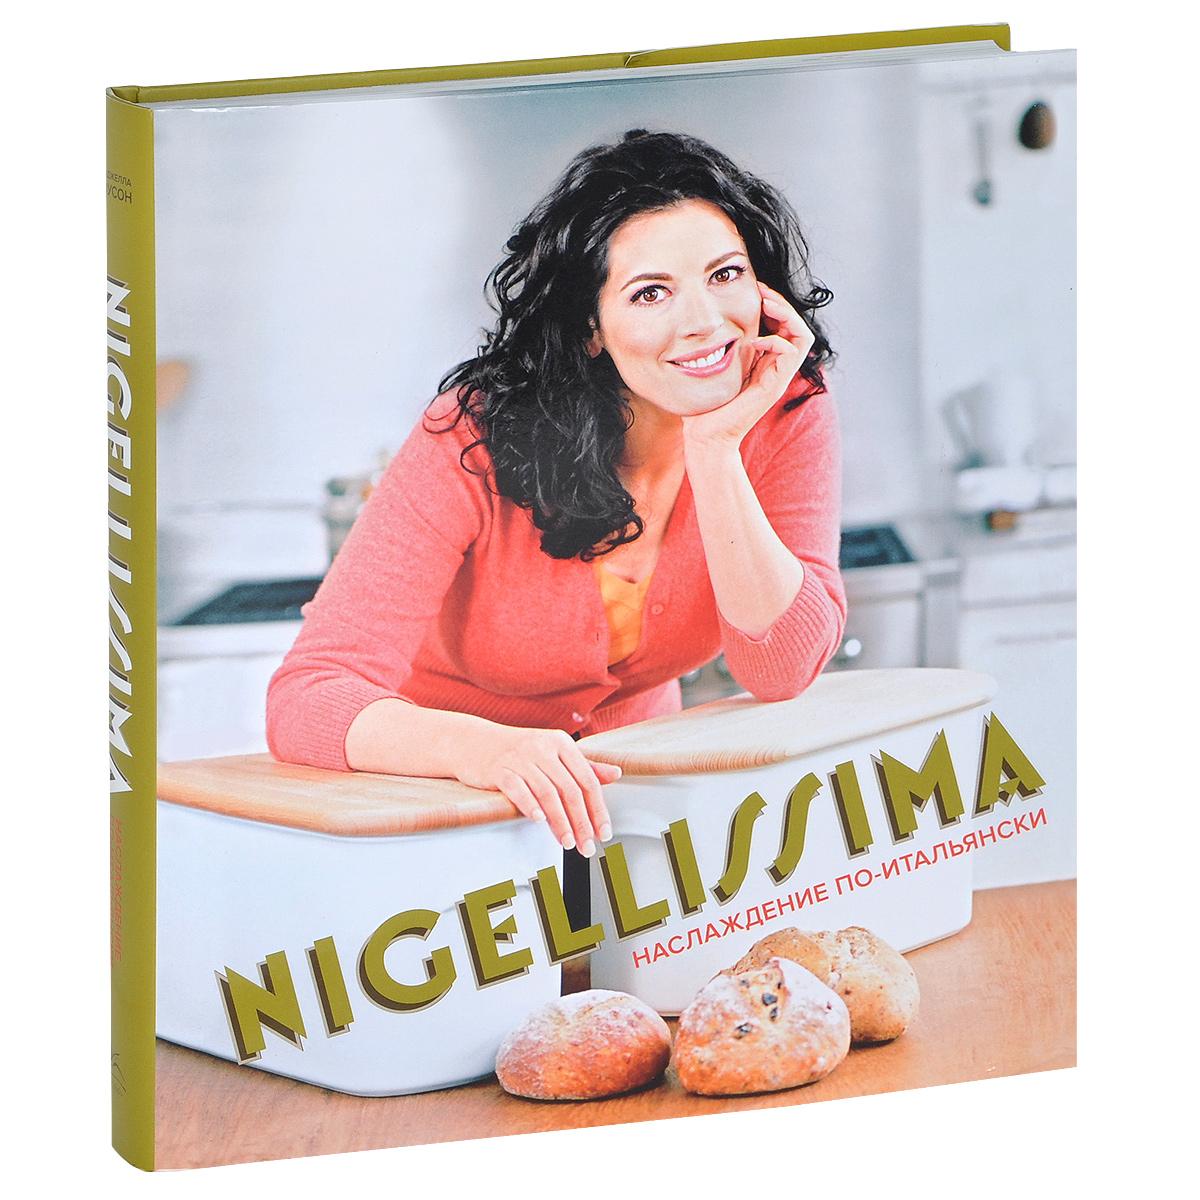 Найджелла Лоусон Nigellissima. Блестящие итальянские идеи